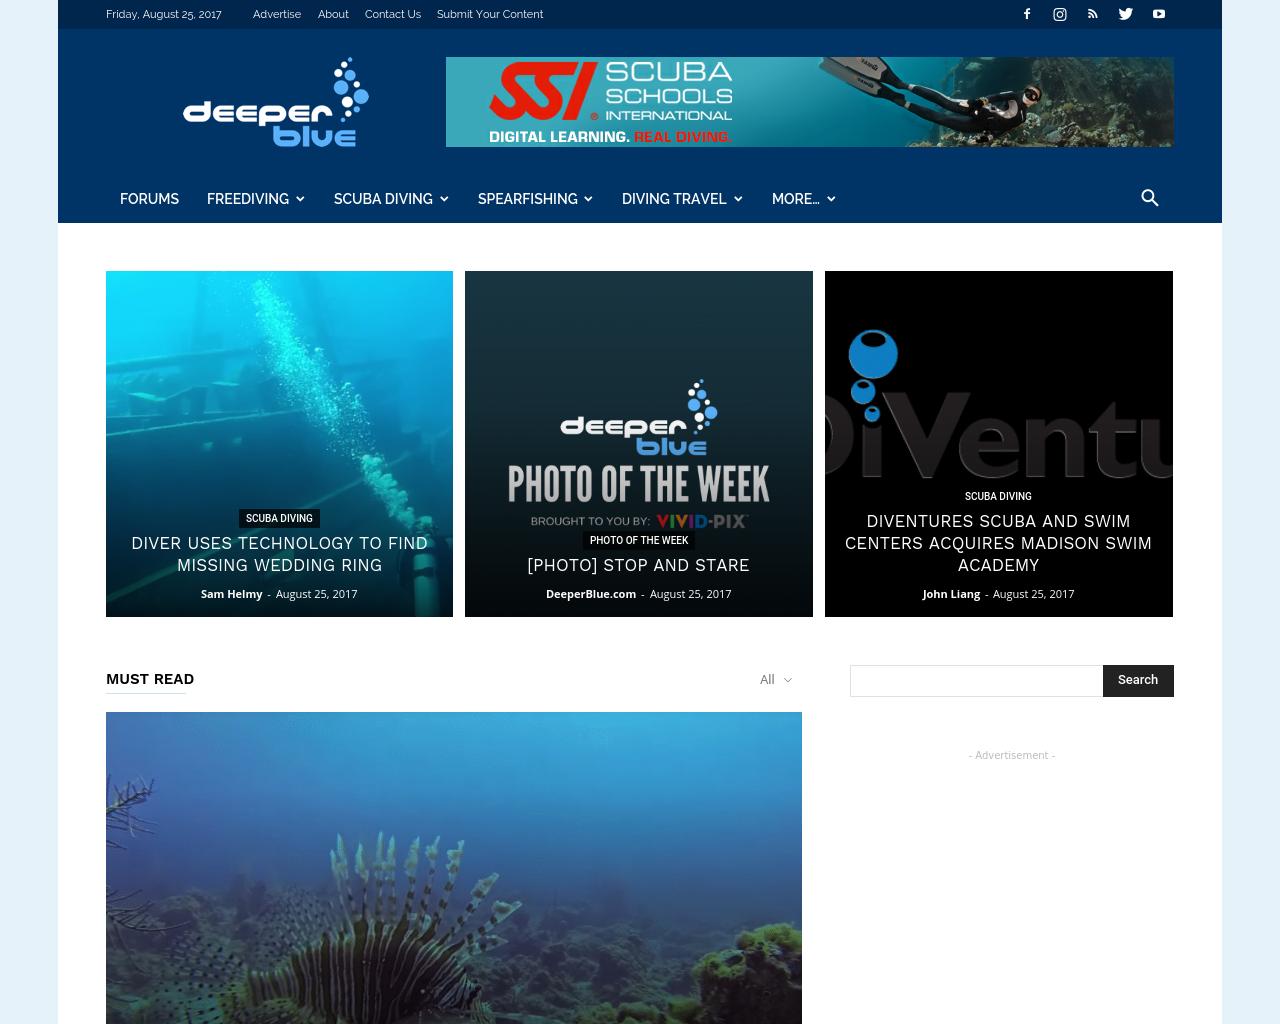 DeeperBlue.com-Advertising-Reviews-Pricing